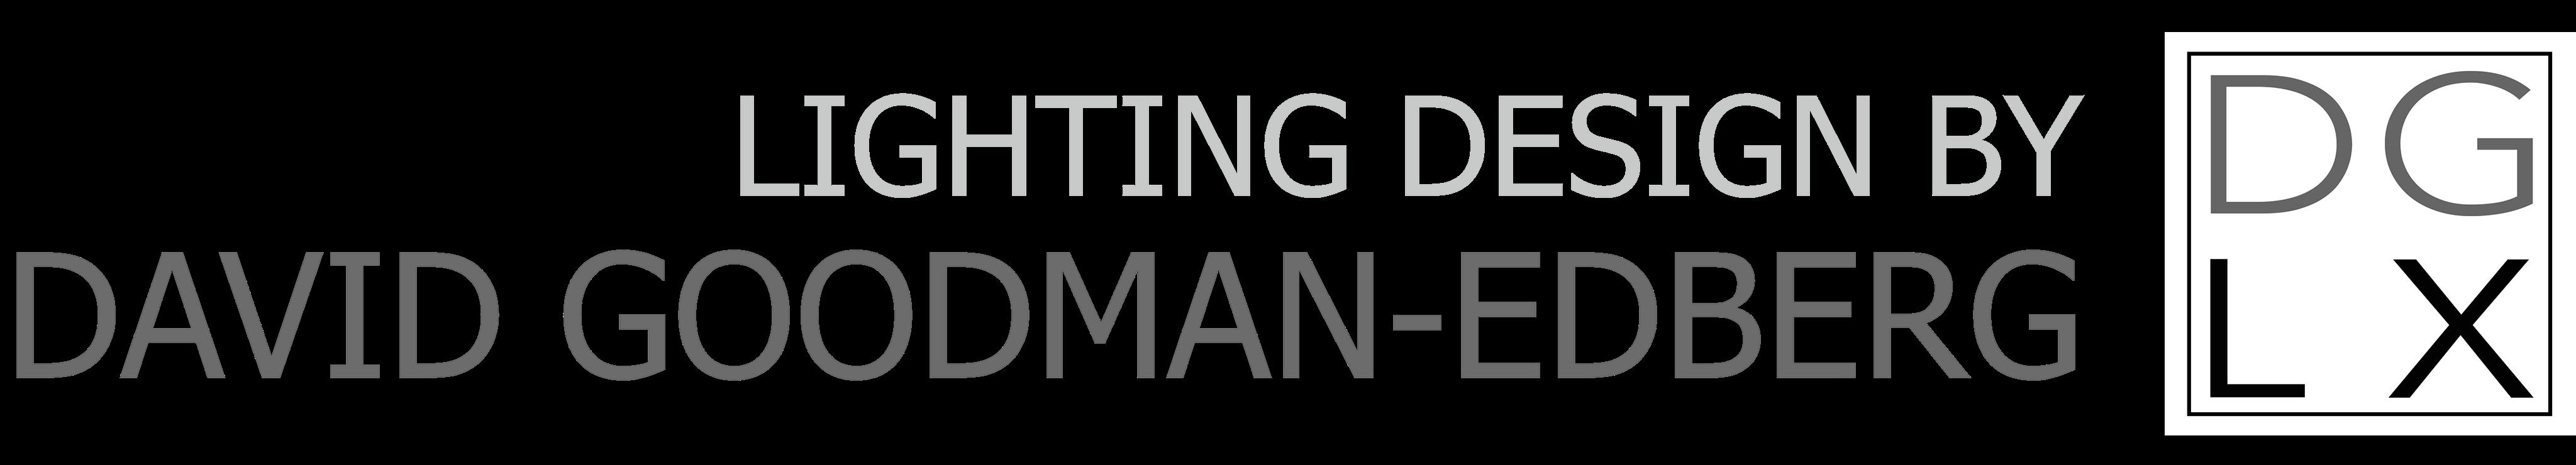 David Goodman-Edberg / Lighting Design